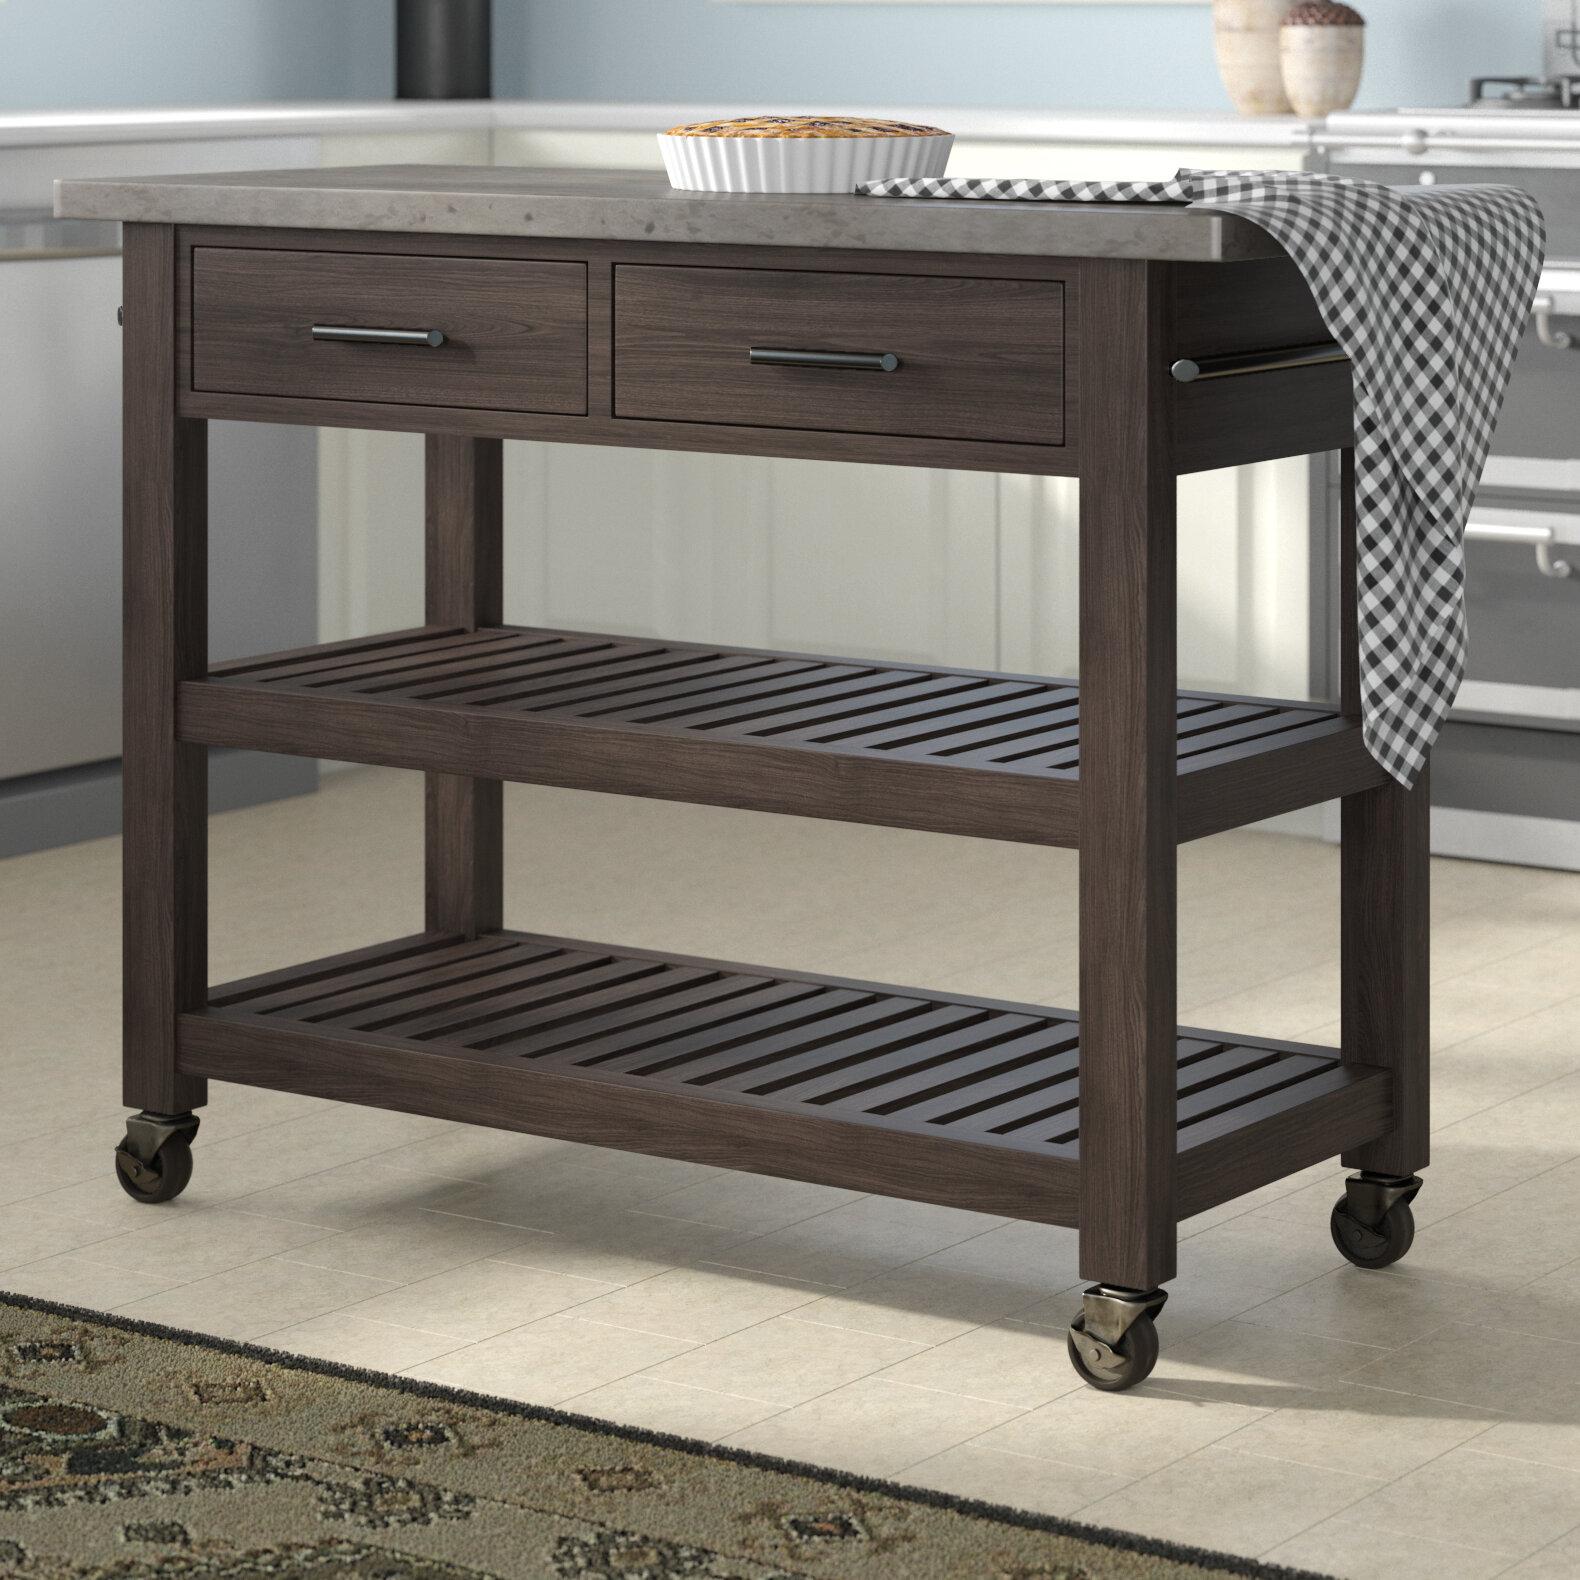 Jameown Kitchen Cart with Concrete Top